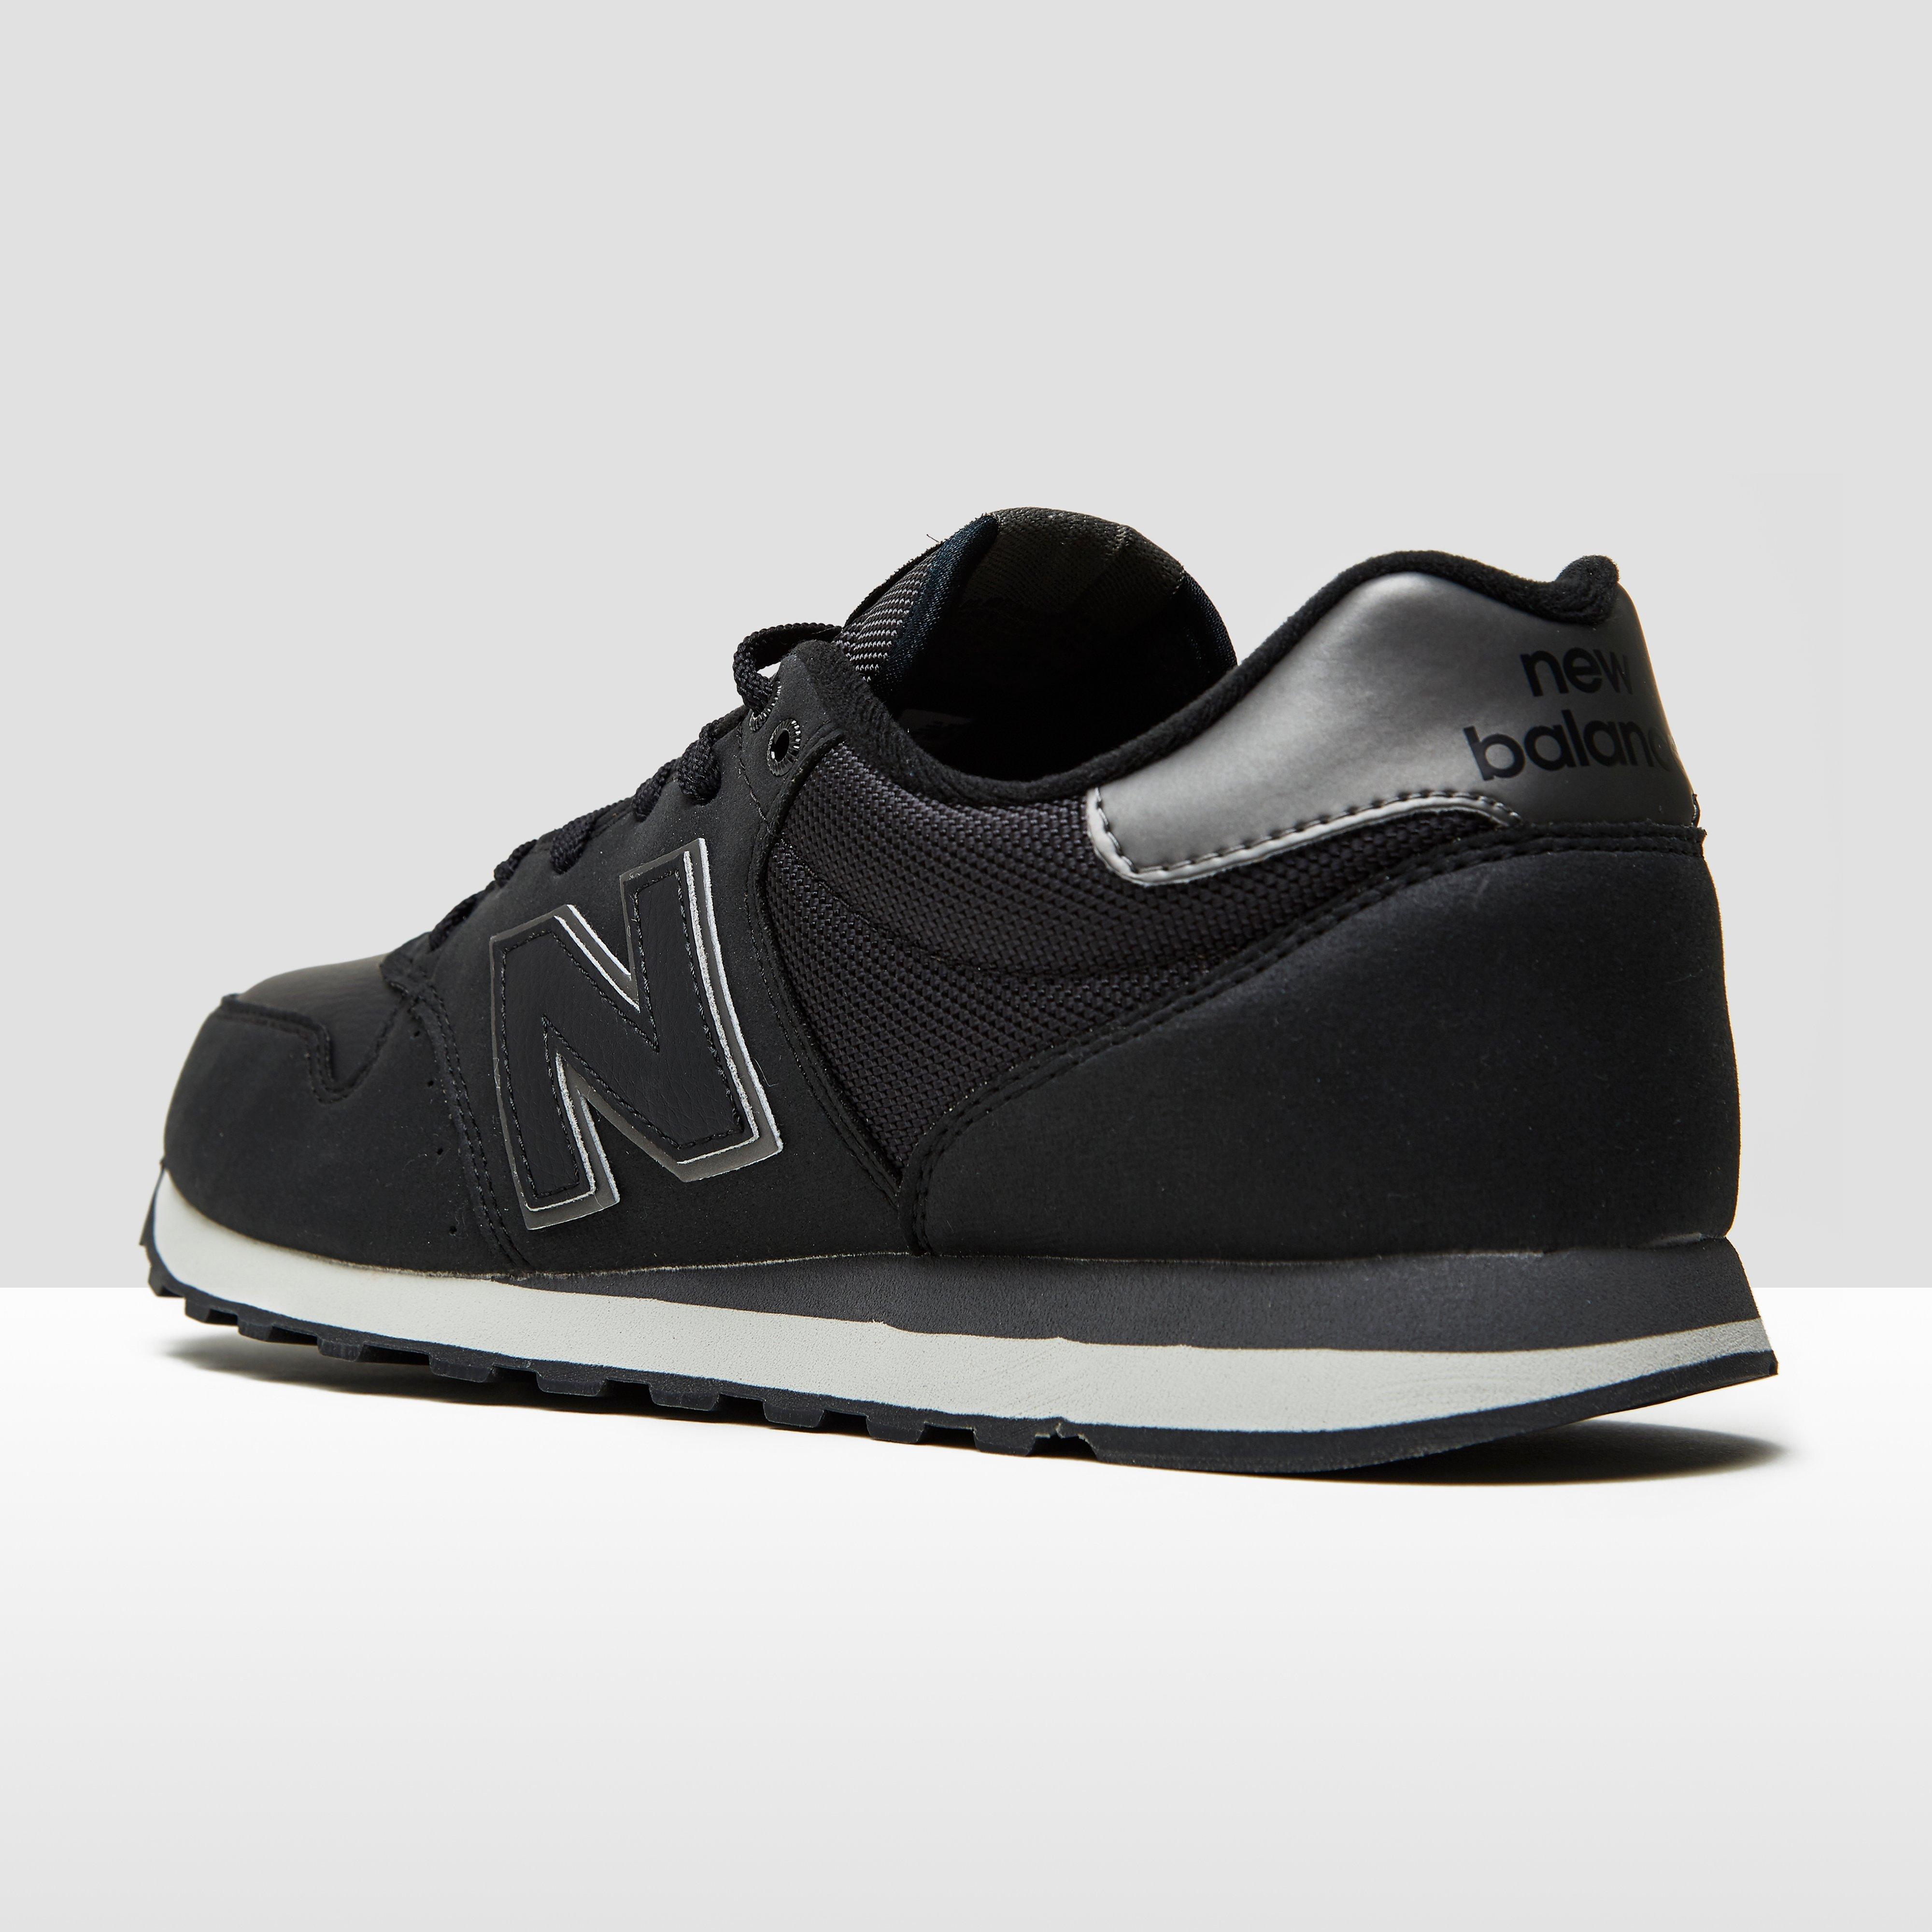 Noir Chaussures New Balance En Taille 46 Hommes U3SIRkgz1